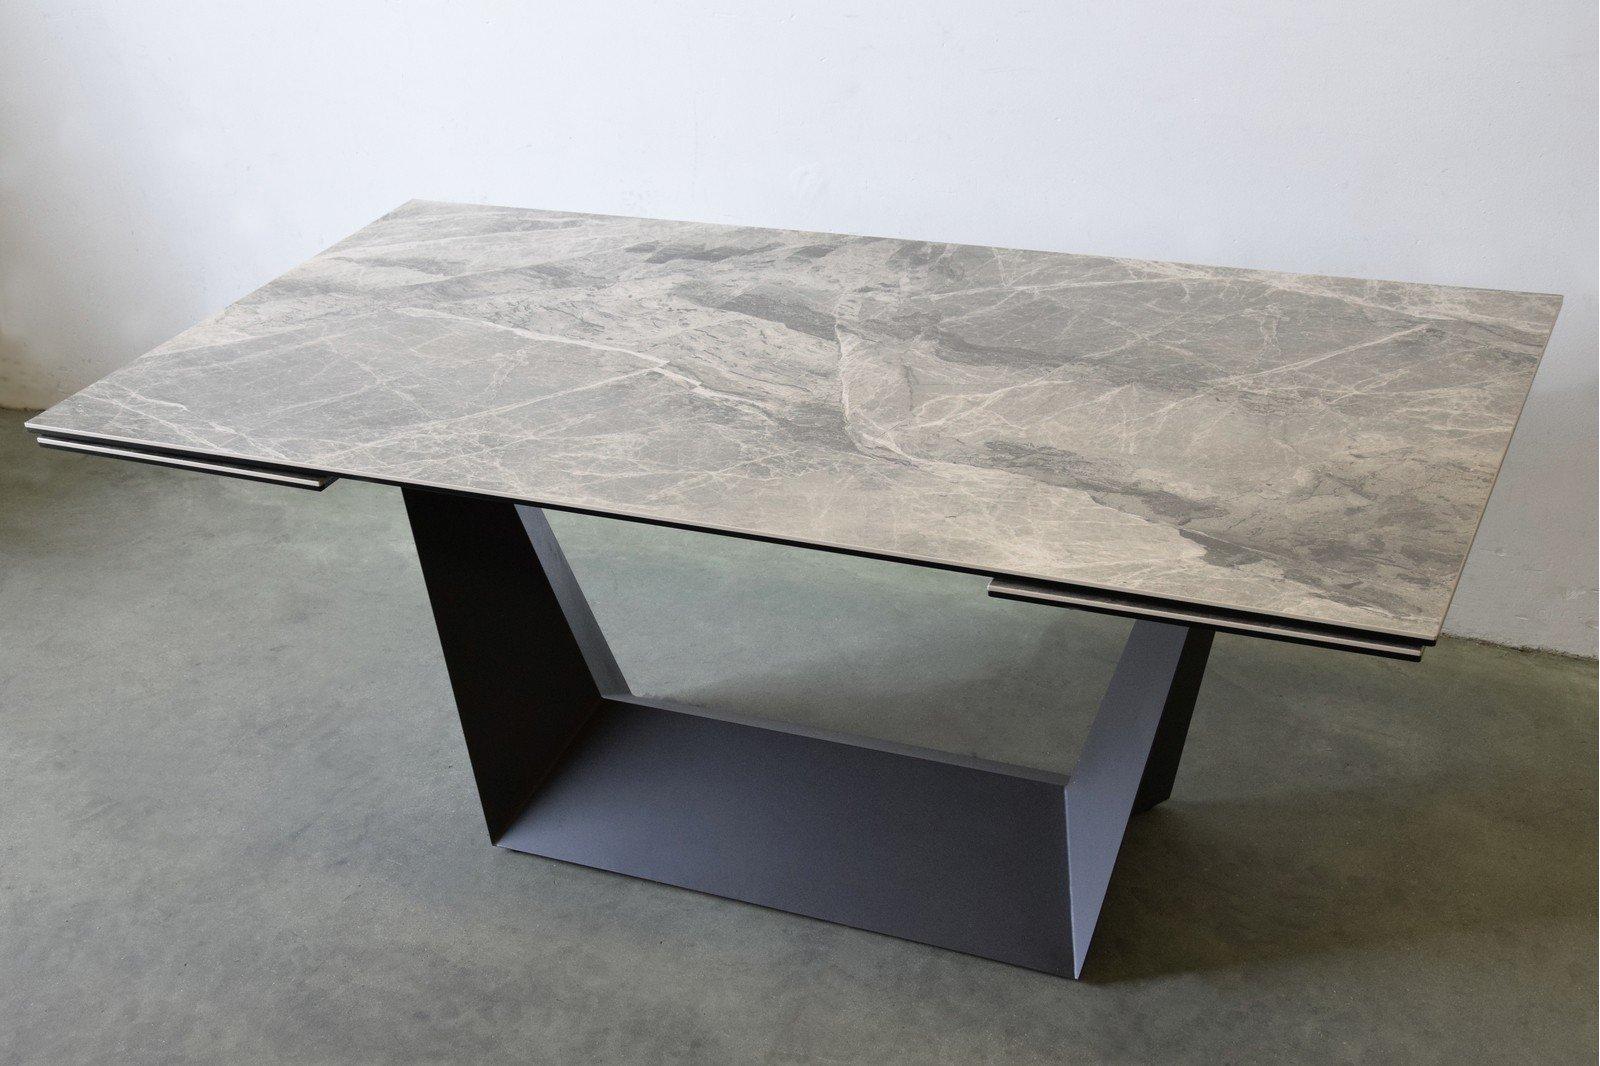 mesa-comedor-extensible-ceramico-metal.jpg